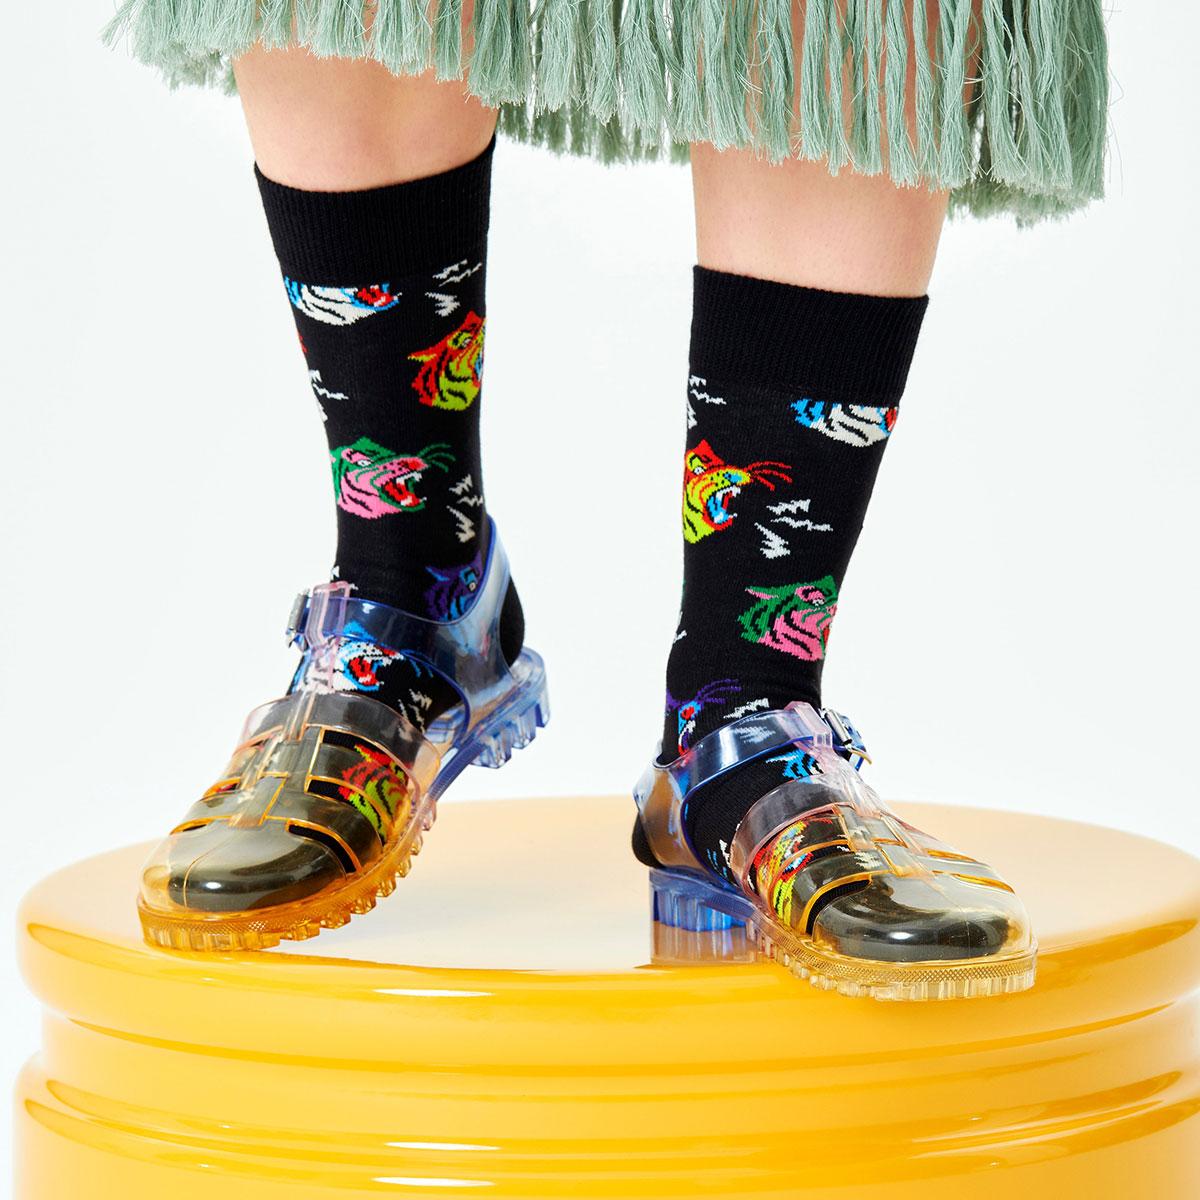 Happy Socks ハッピーソックス  TIGER ( タイガー ) クルー丈 綿混 ソックス 靴下 ユニセックス メンズ & レディス プレゼント 贈答 ギフト 10211014【ゆうパケット220円・4点まで】